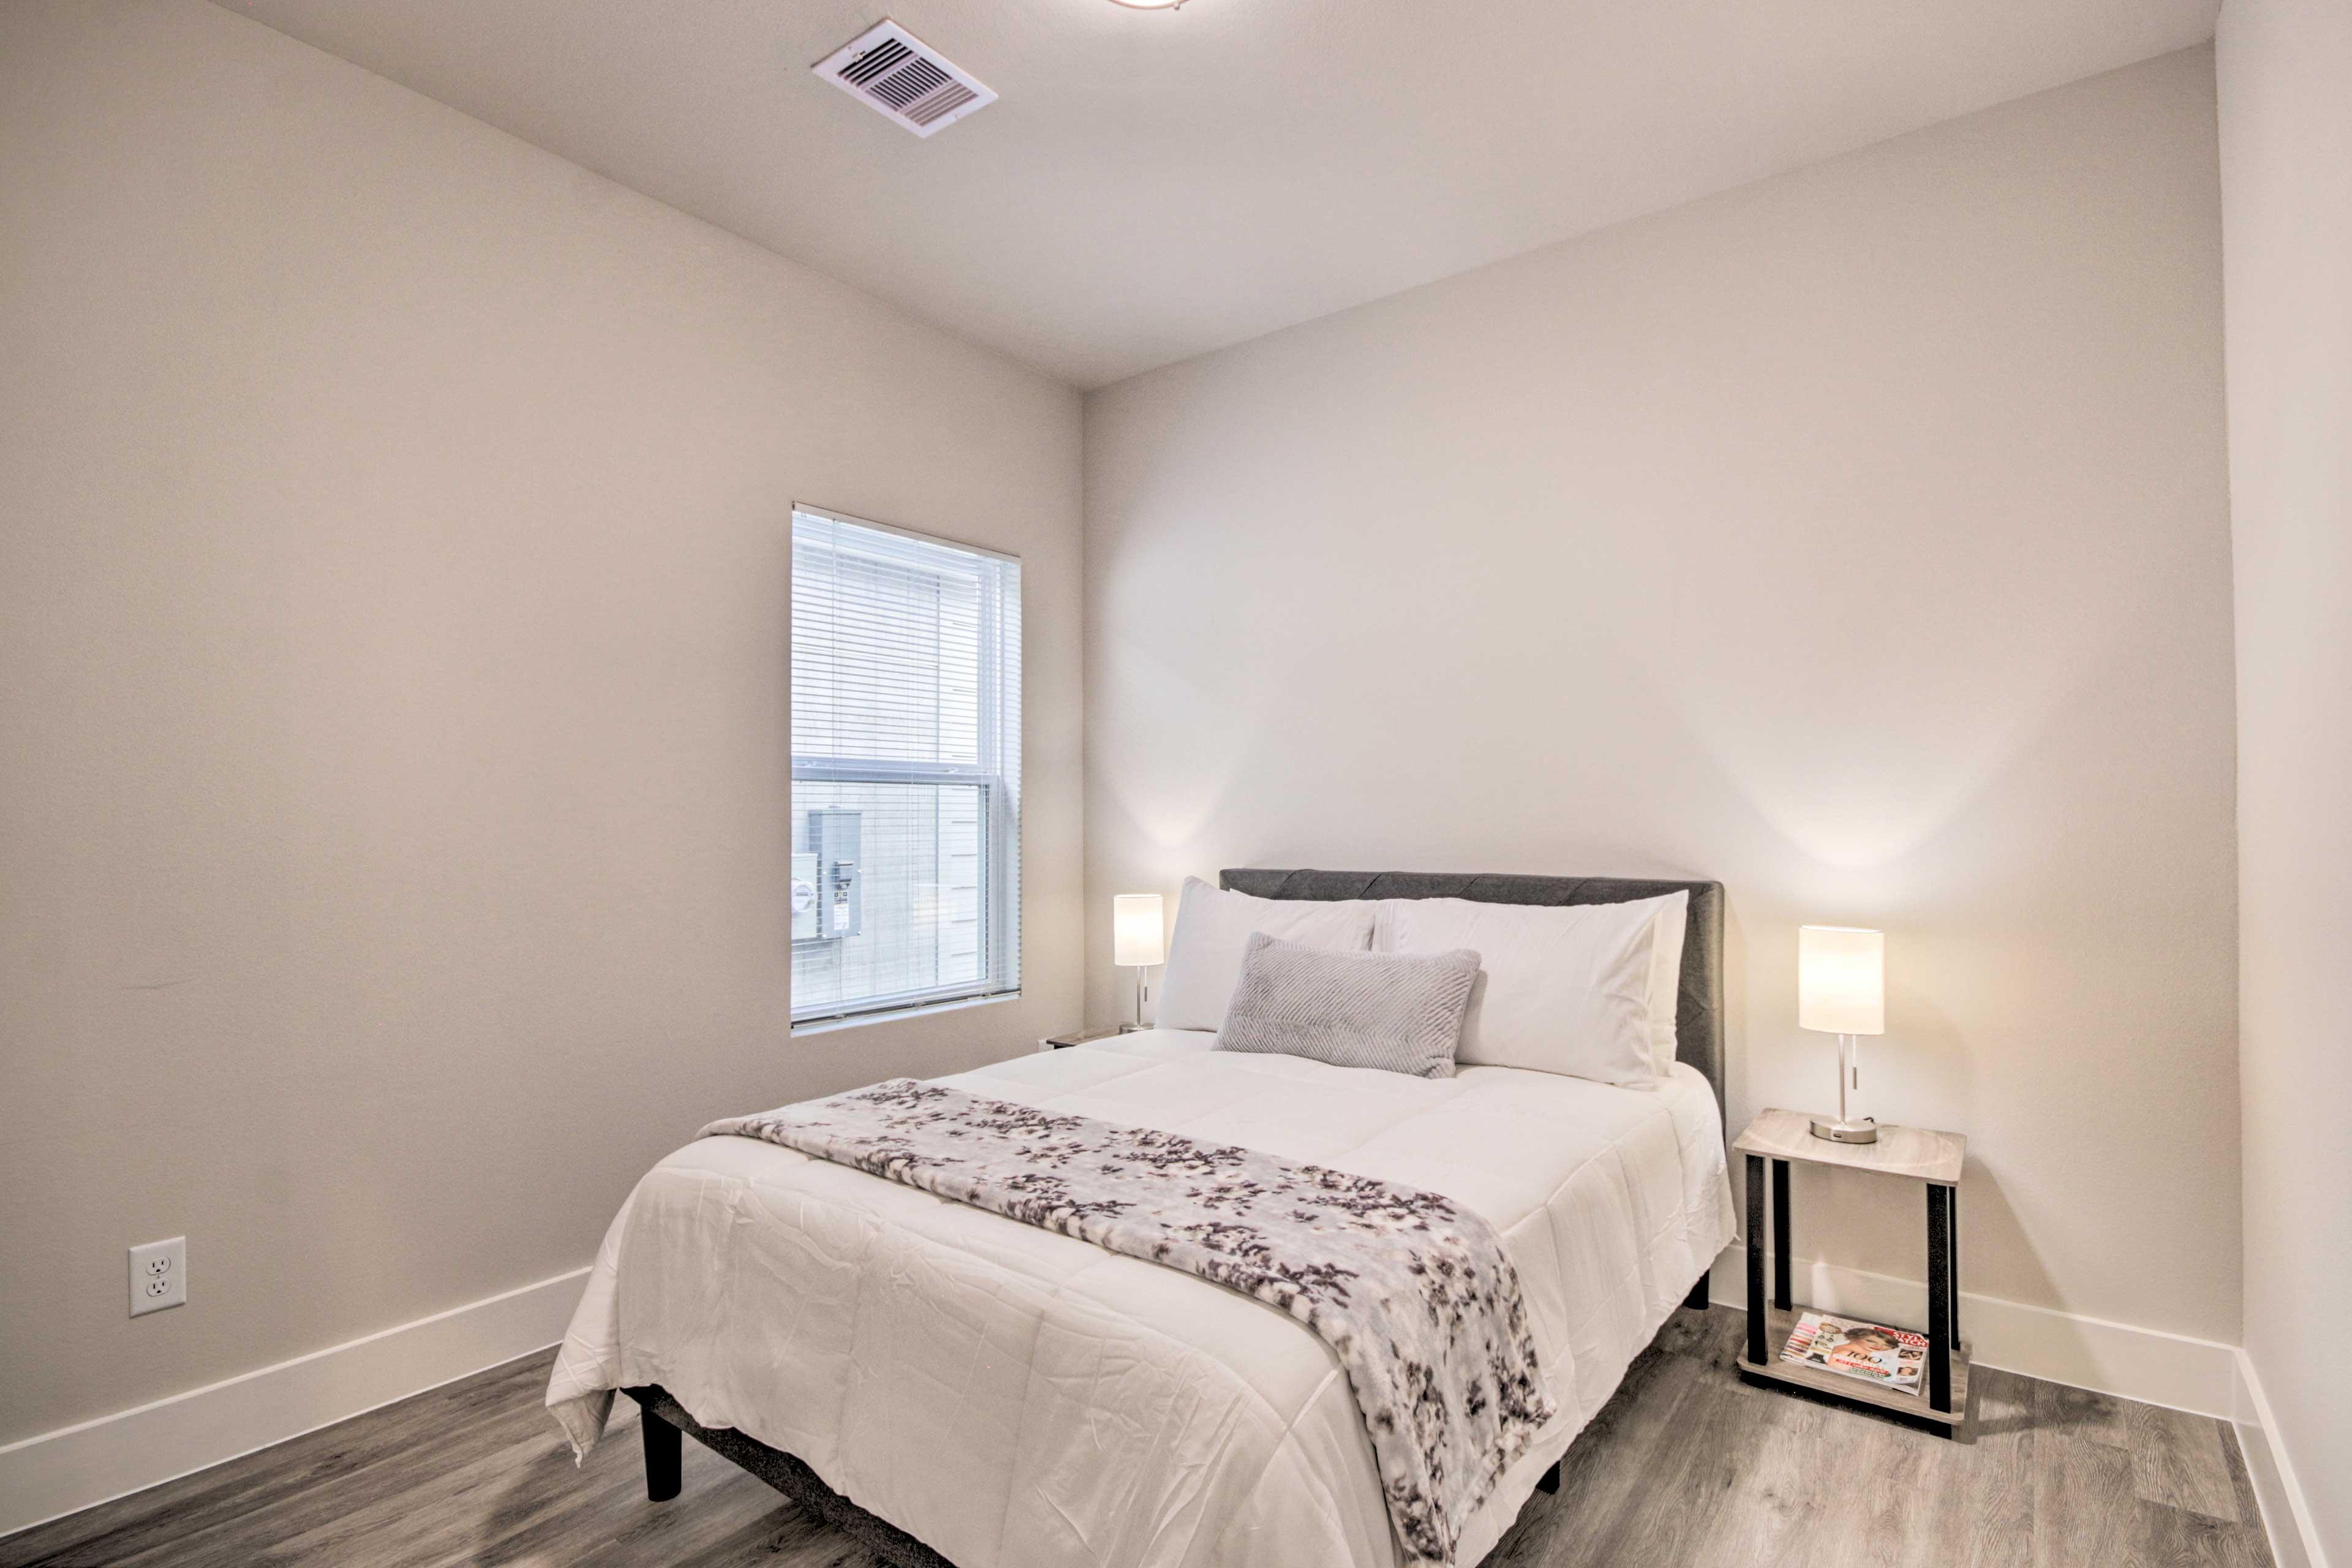 Bedroom 3 | Full Bed